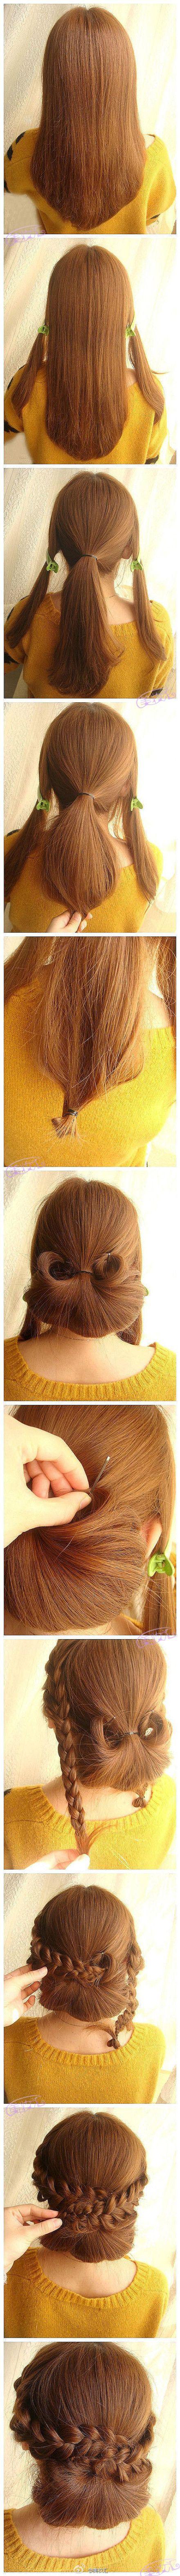 Pin by christi jones on super fun stuff pinterest updo hair